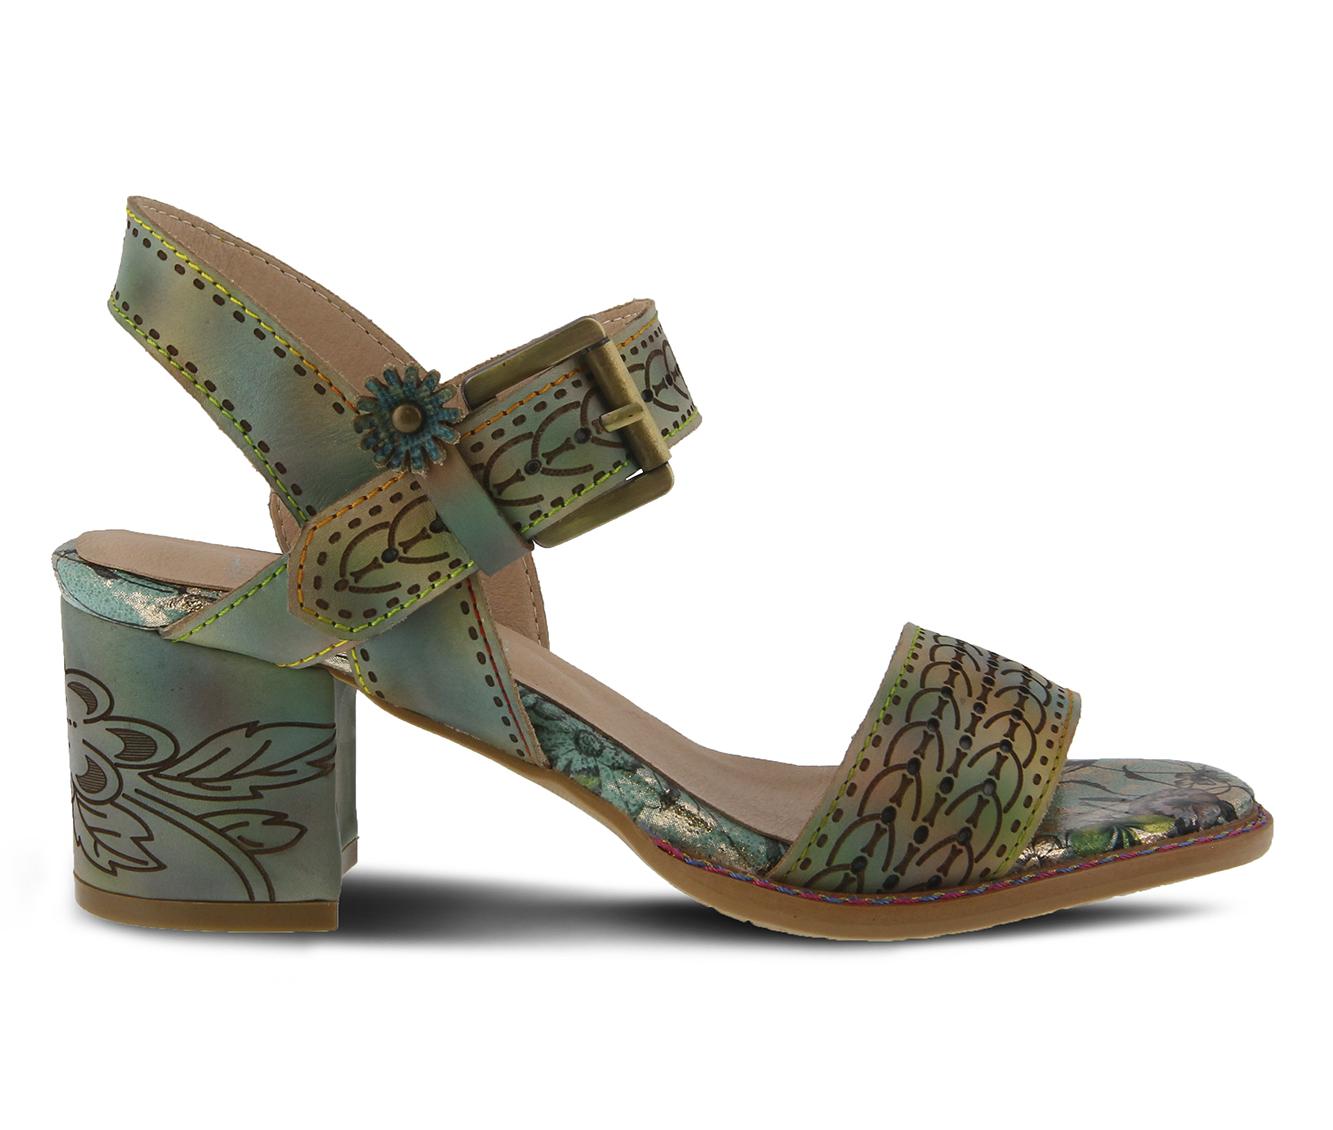 L'Artiste Avonora Women's Dress Shoe (Green Leather)